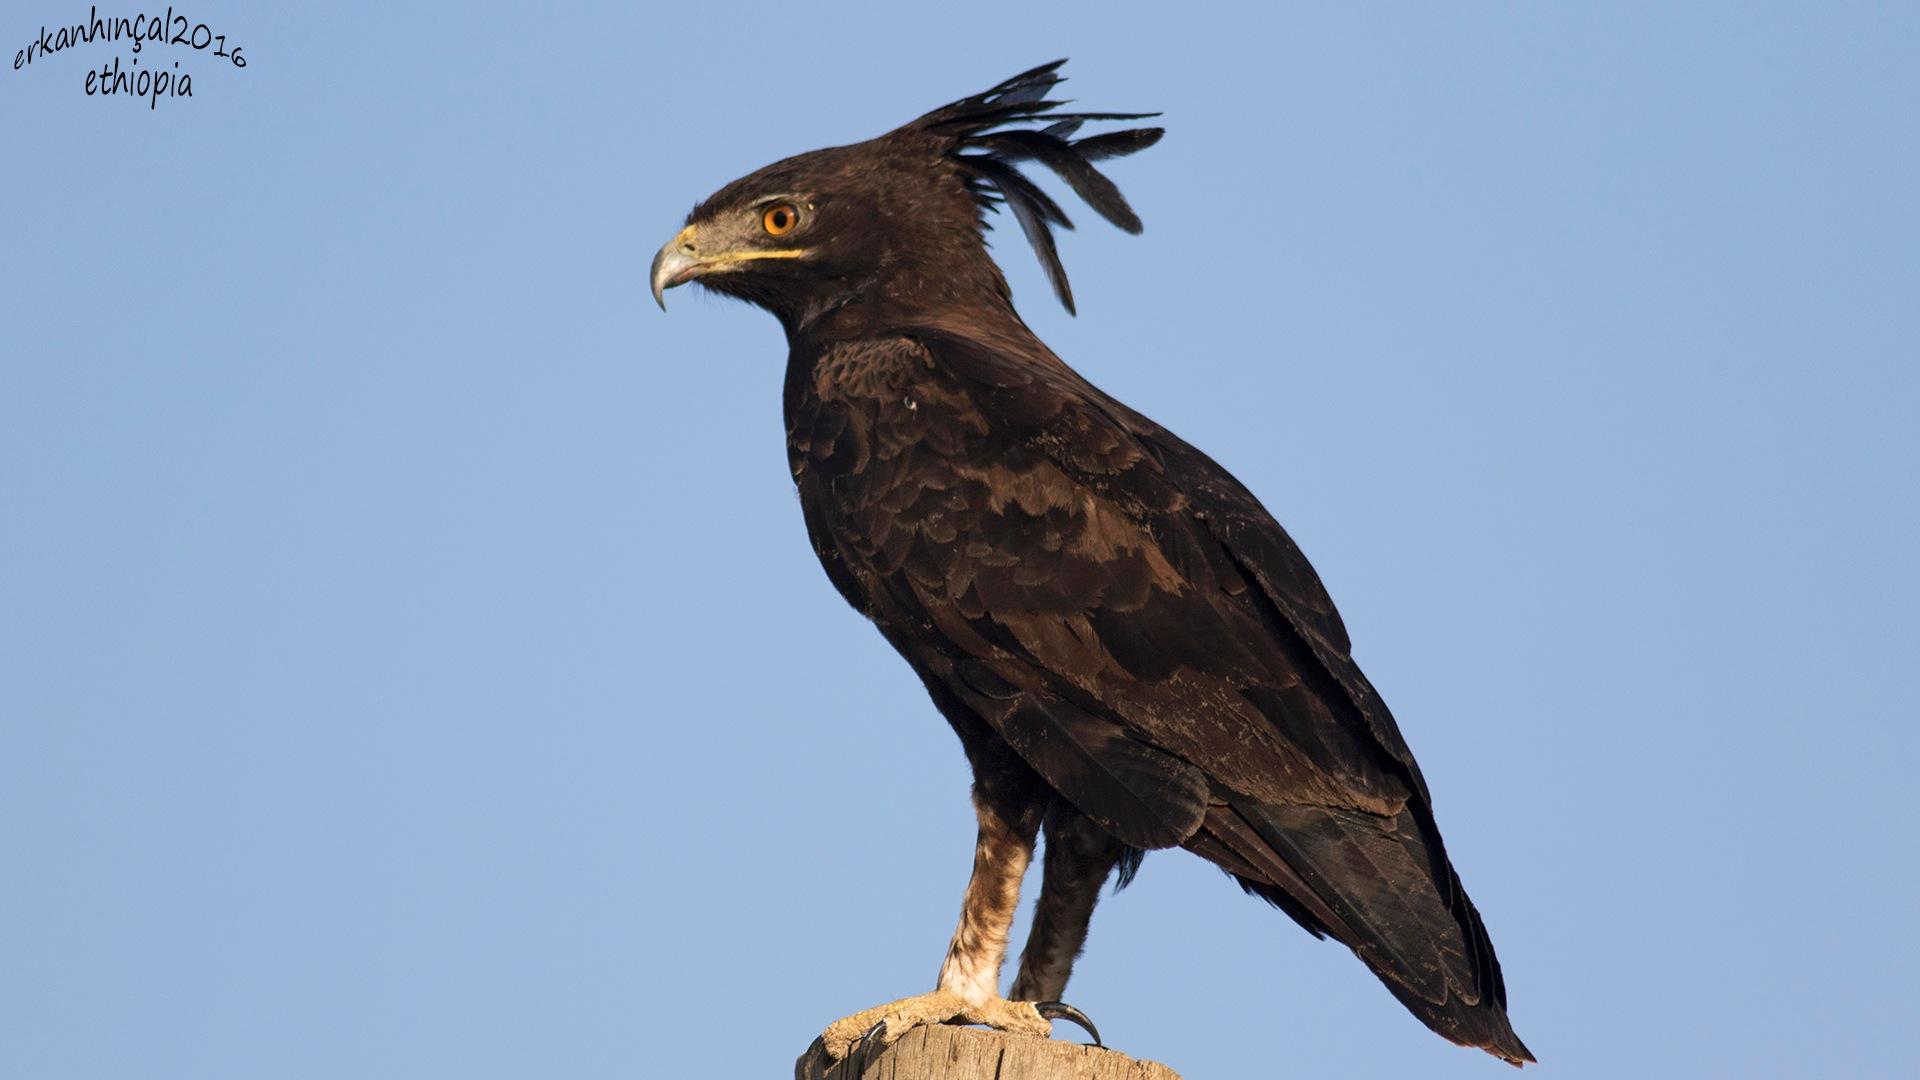 long-crested eagle by ŞAMİL erkanhincal